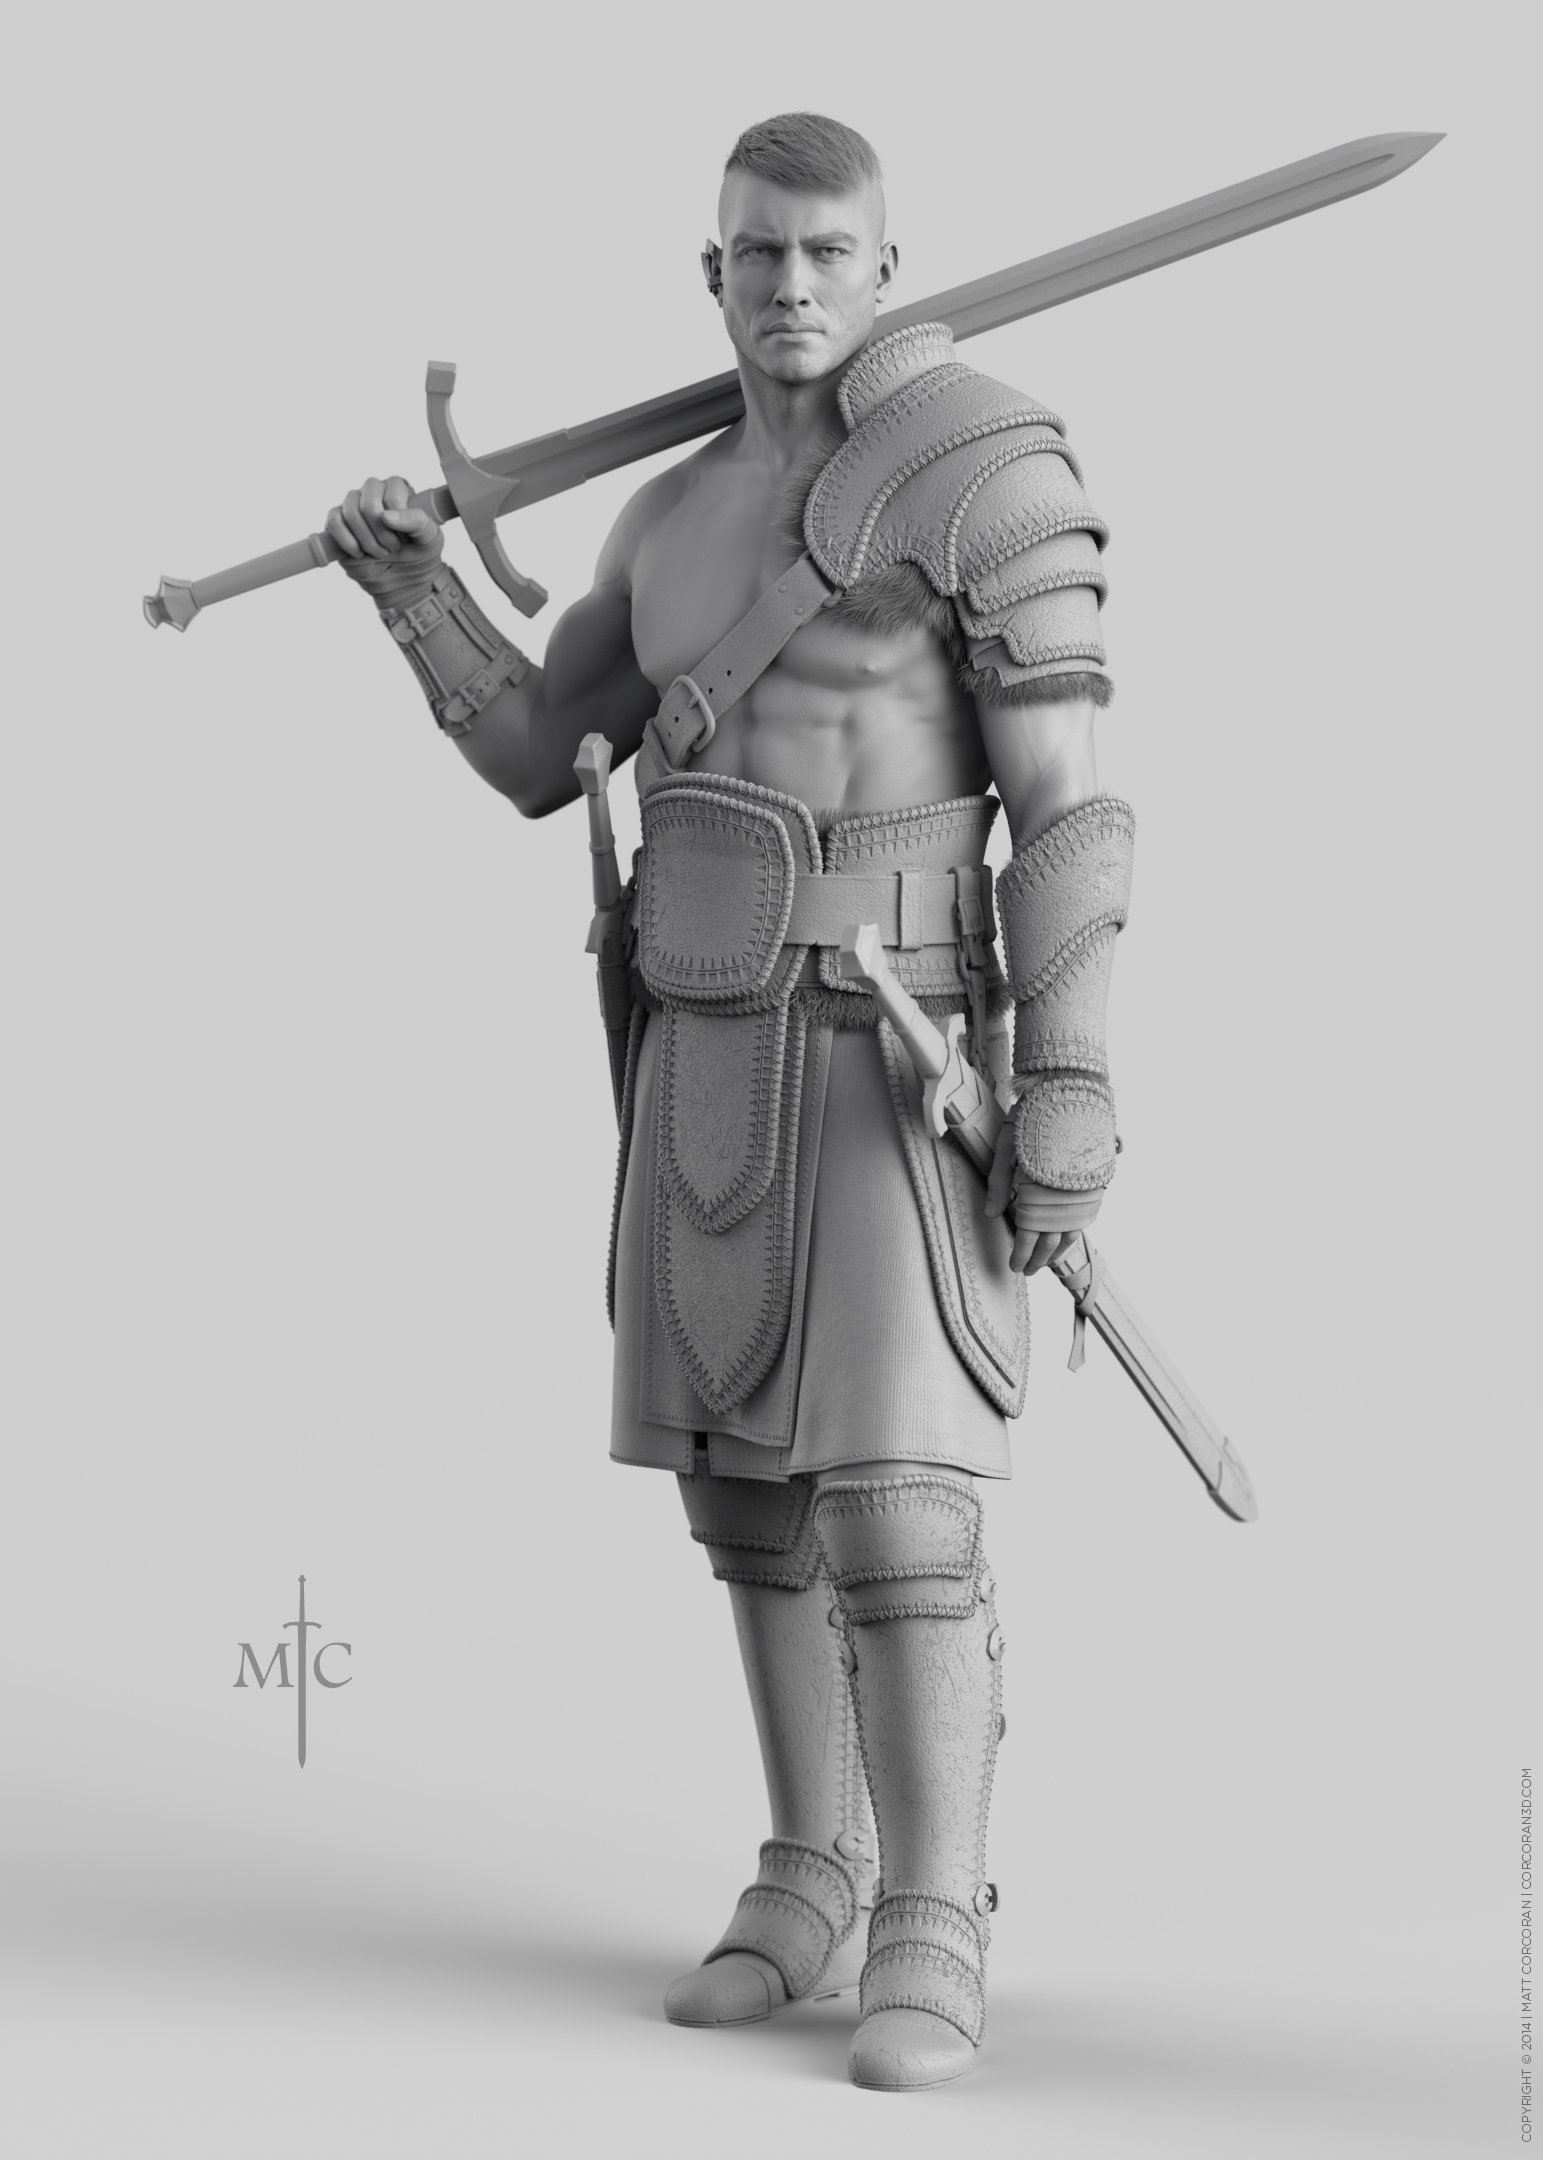 Matt corcoran mattcorcoran warrior grey 5x7 01